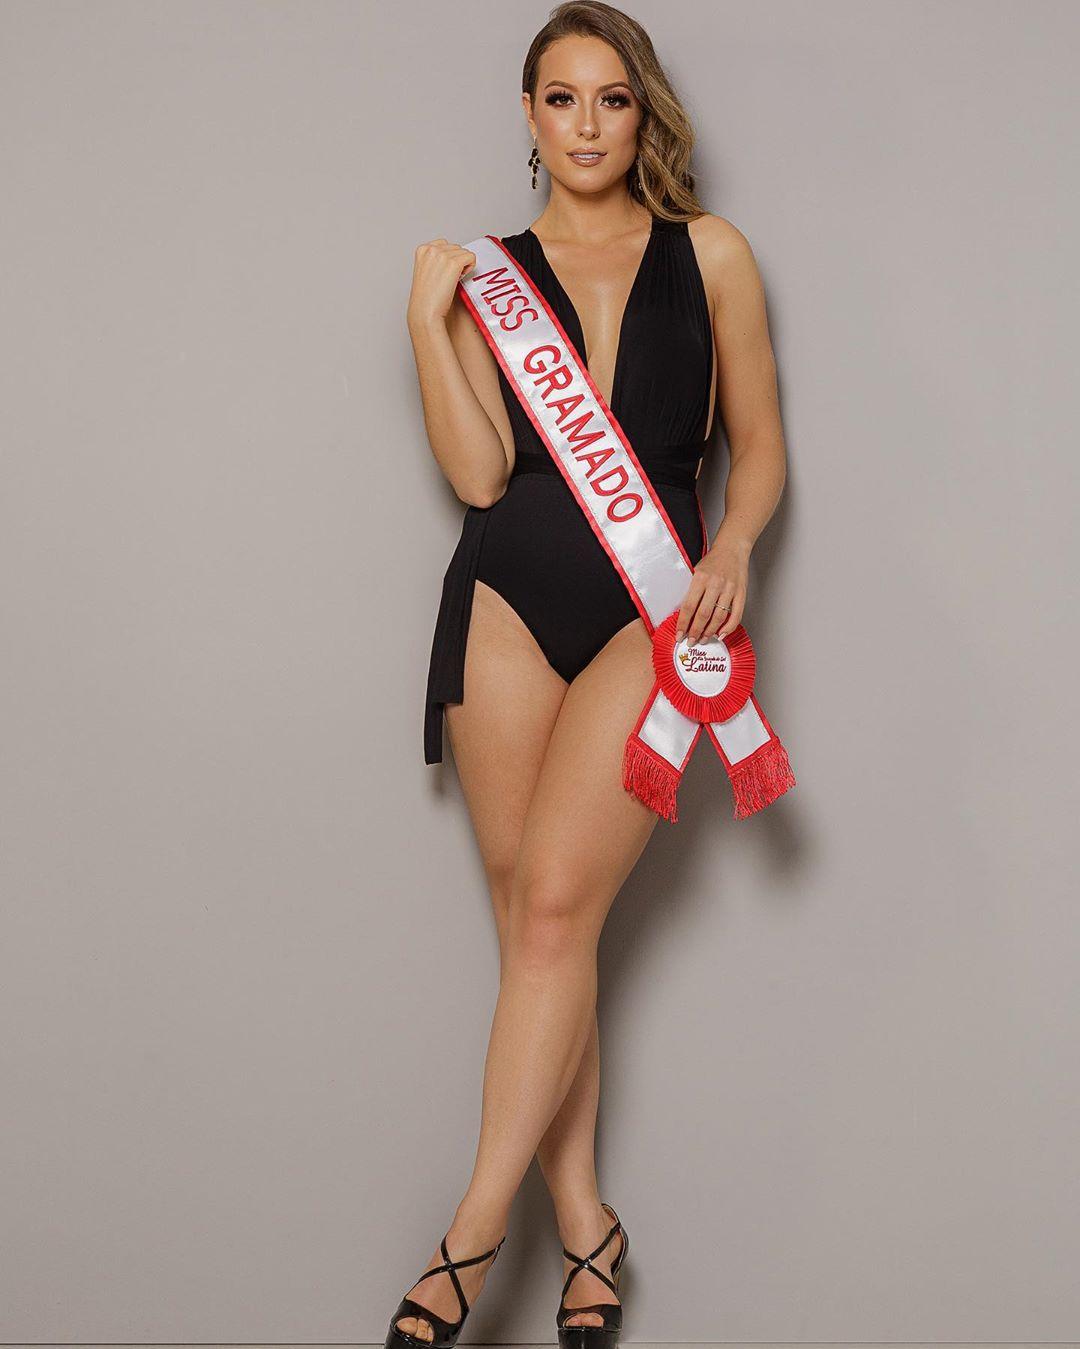 cristine boff sartor, segunda finalista de miss latinoamerica 2019. - Página 6 67147410